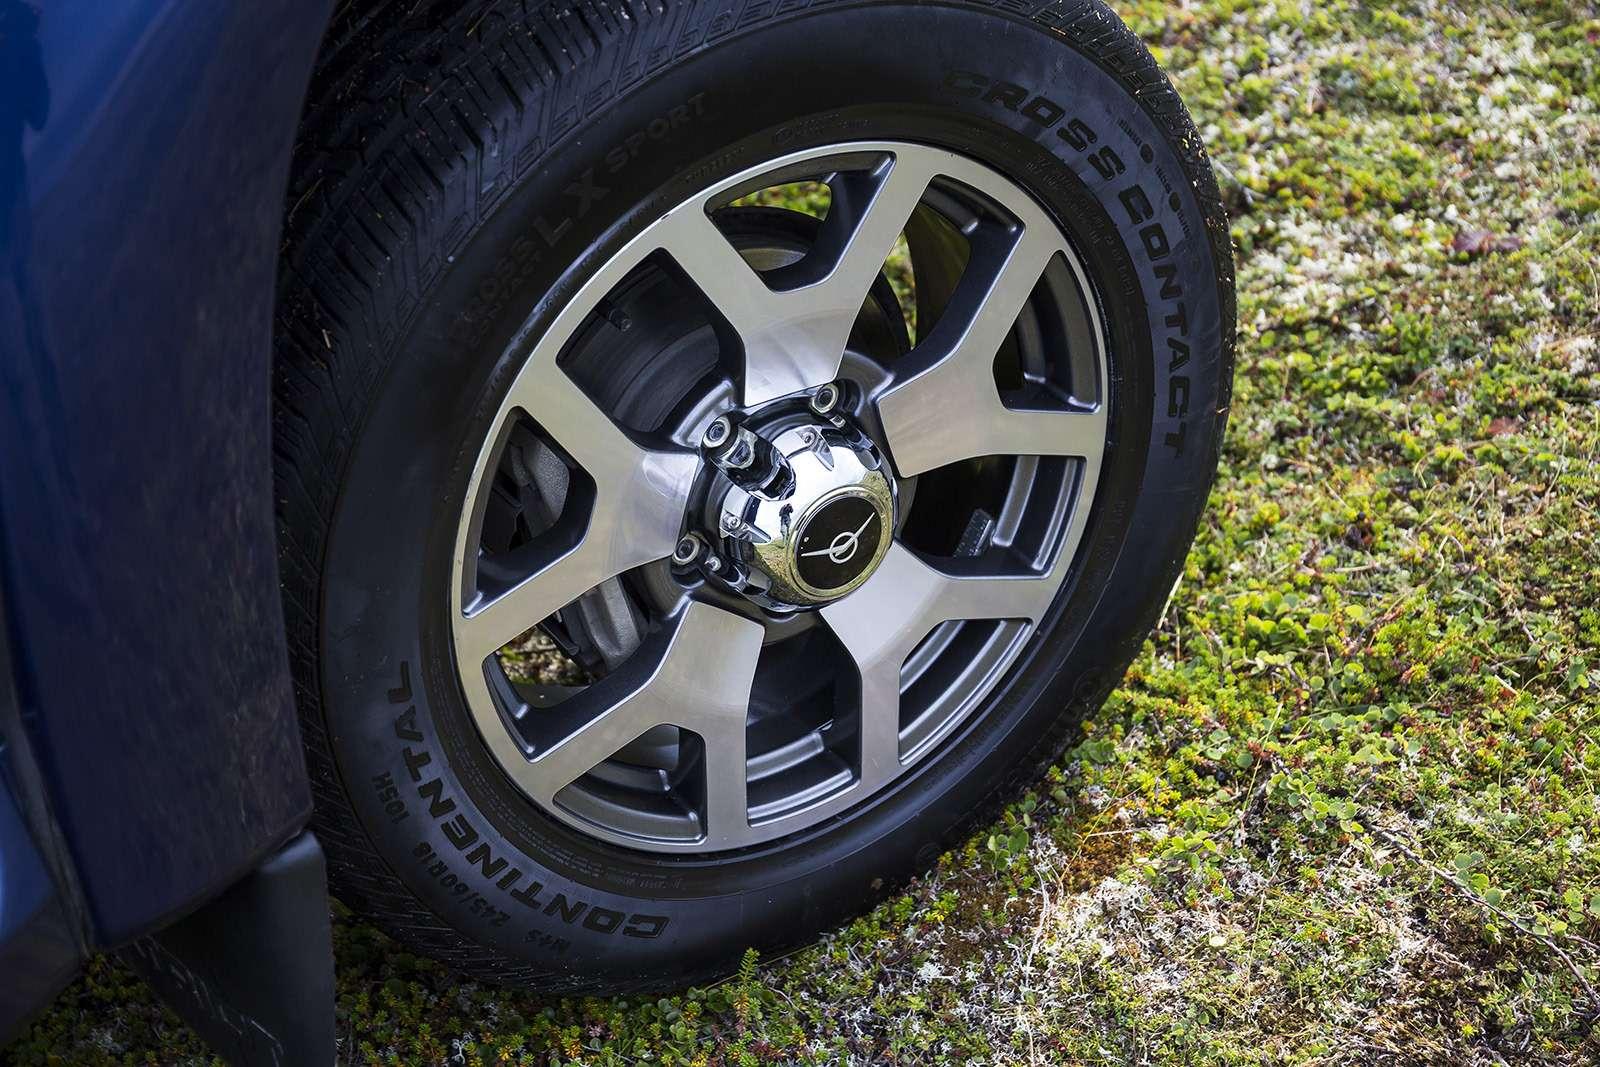 Обновленный УАЗ Патриот: ставка накомфорт— фото 906856